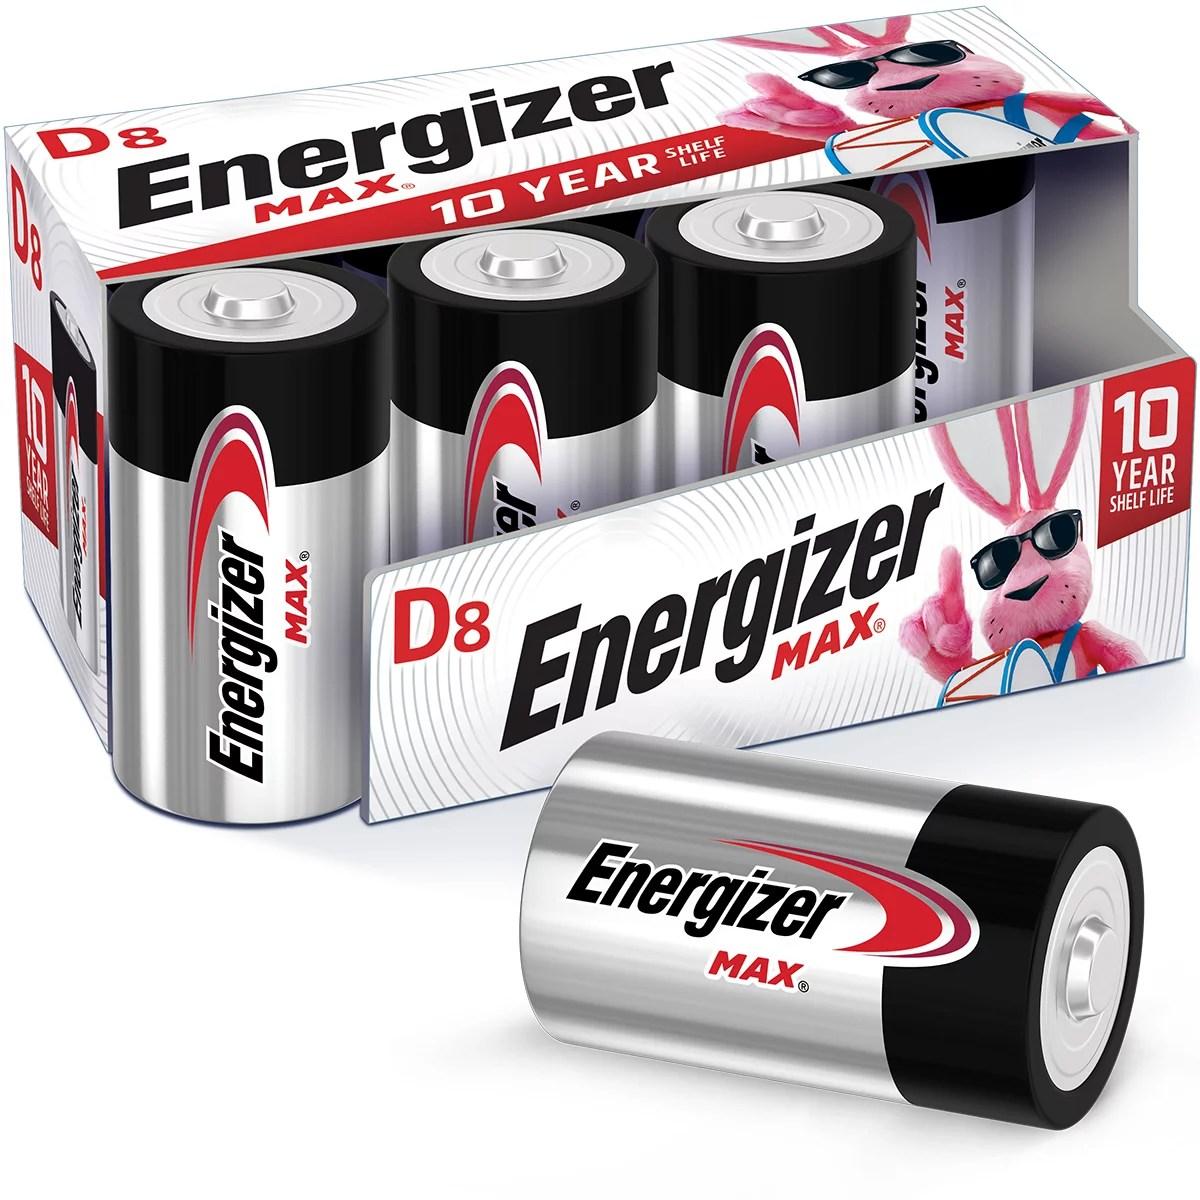 Energizer Max Alkaline D Batteries 8-Pack